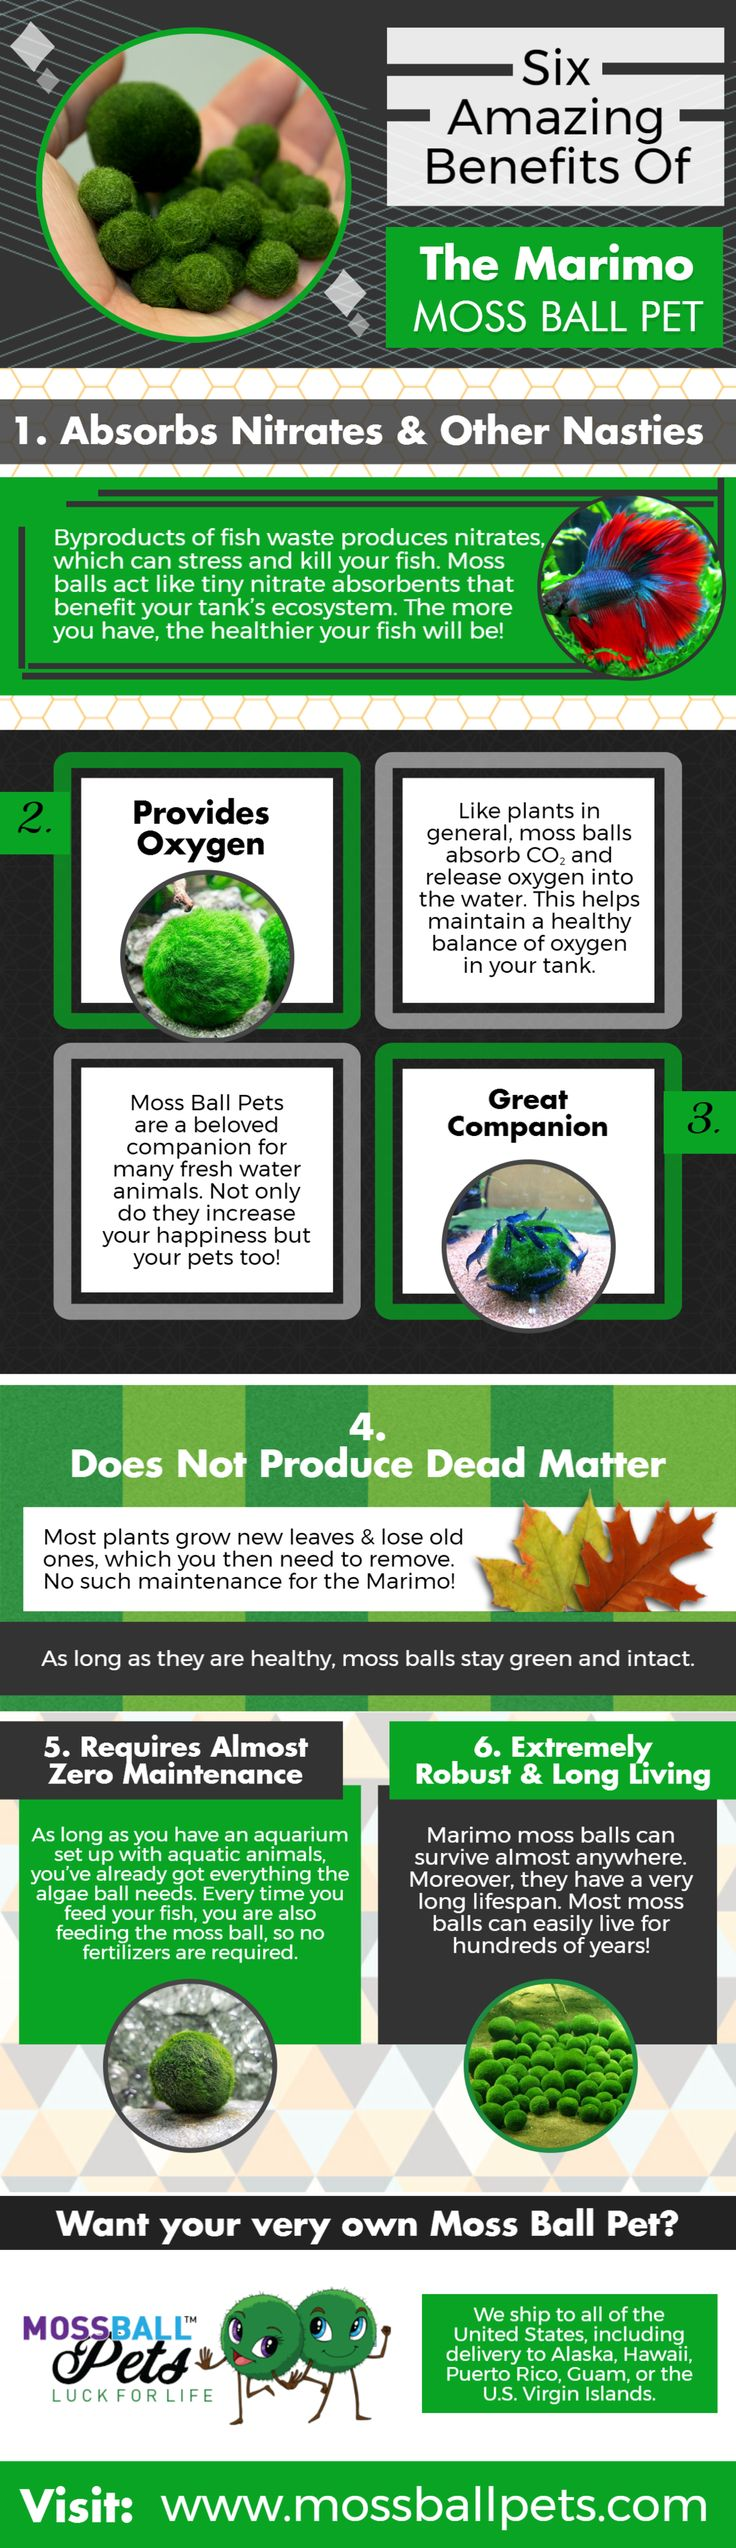 Six Amazing Benefits Of The Marimo Moss Ball Pet for more visit: https://mossballpets.com